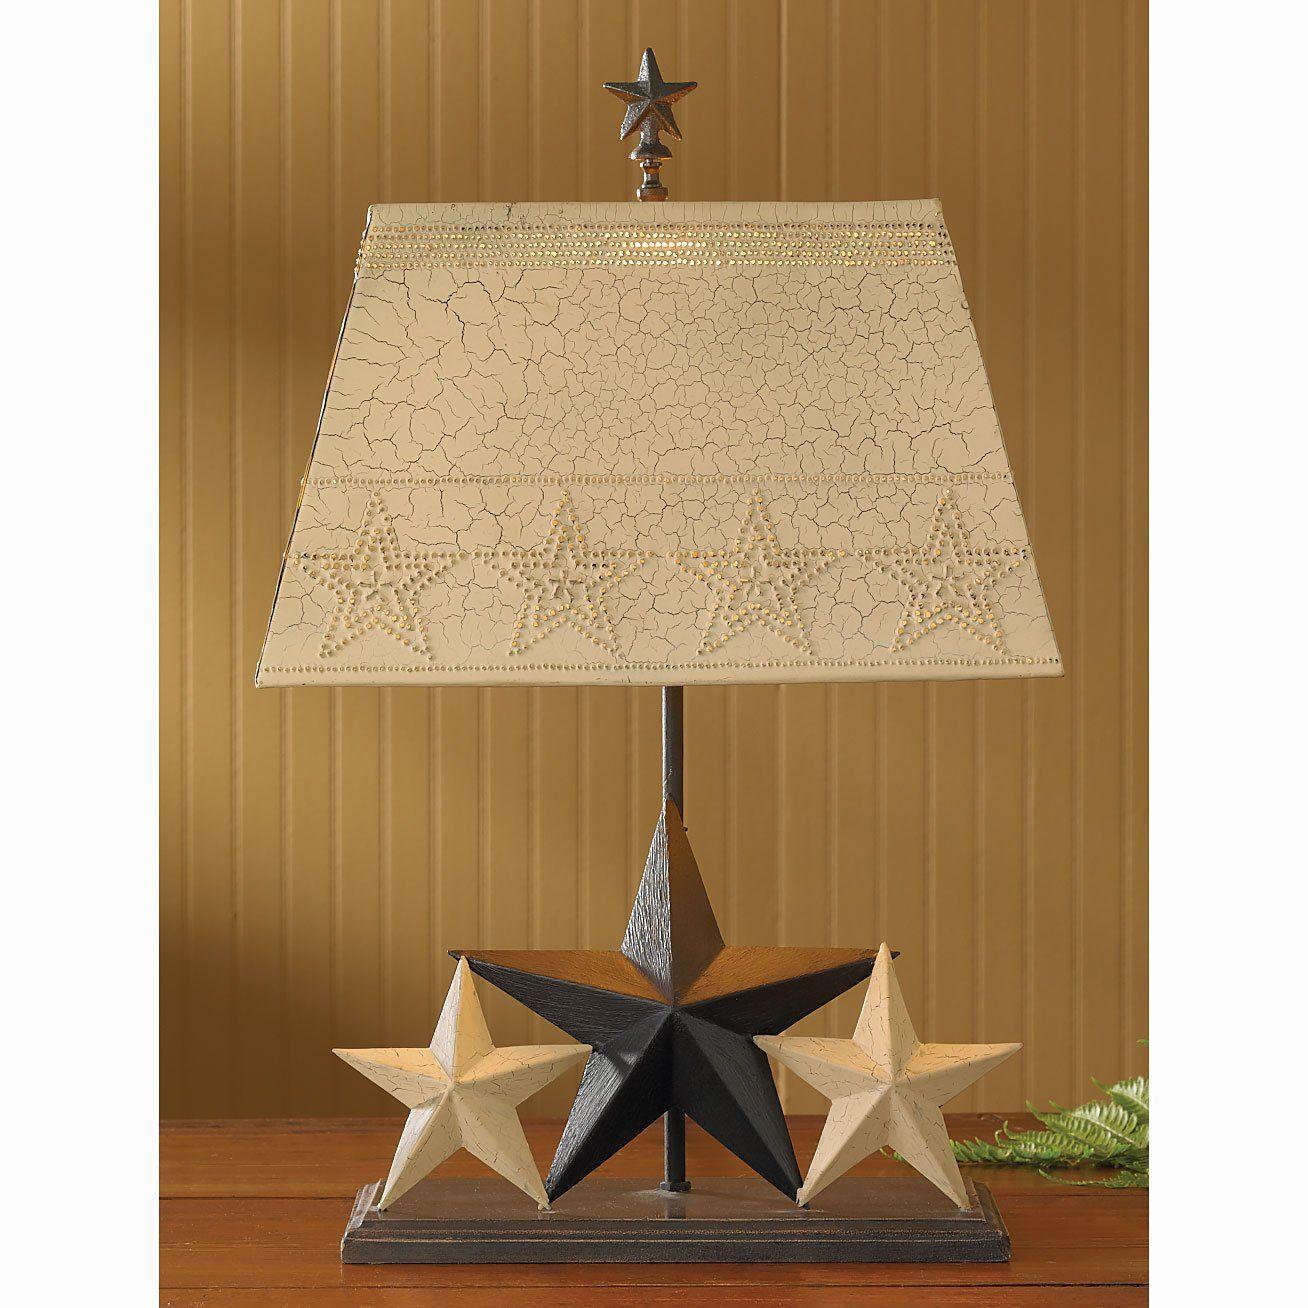 Three Star Lamp With Shade 25 263 K In 2020 Star Lamp Primitive Lamps Lamp